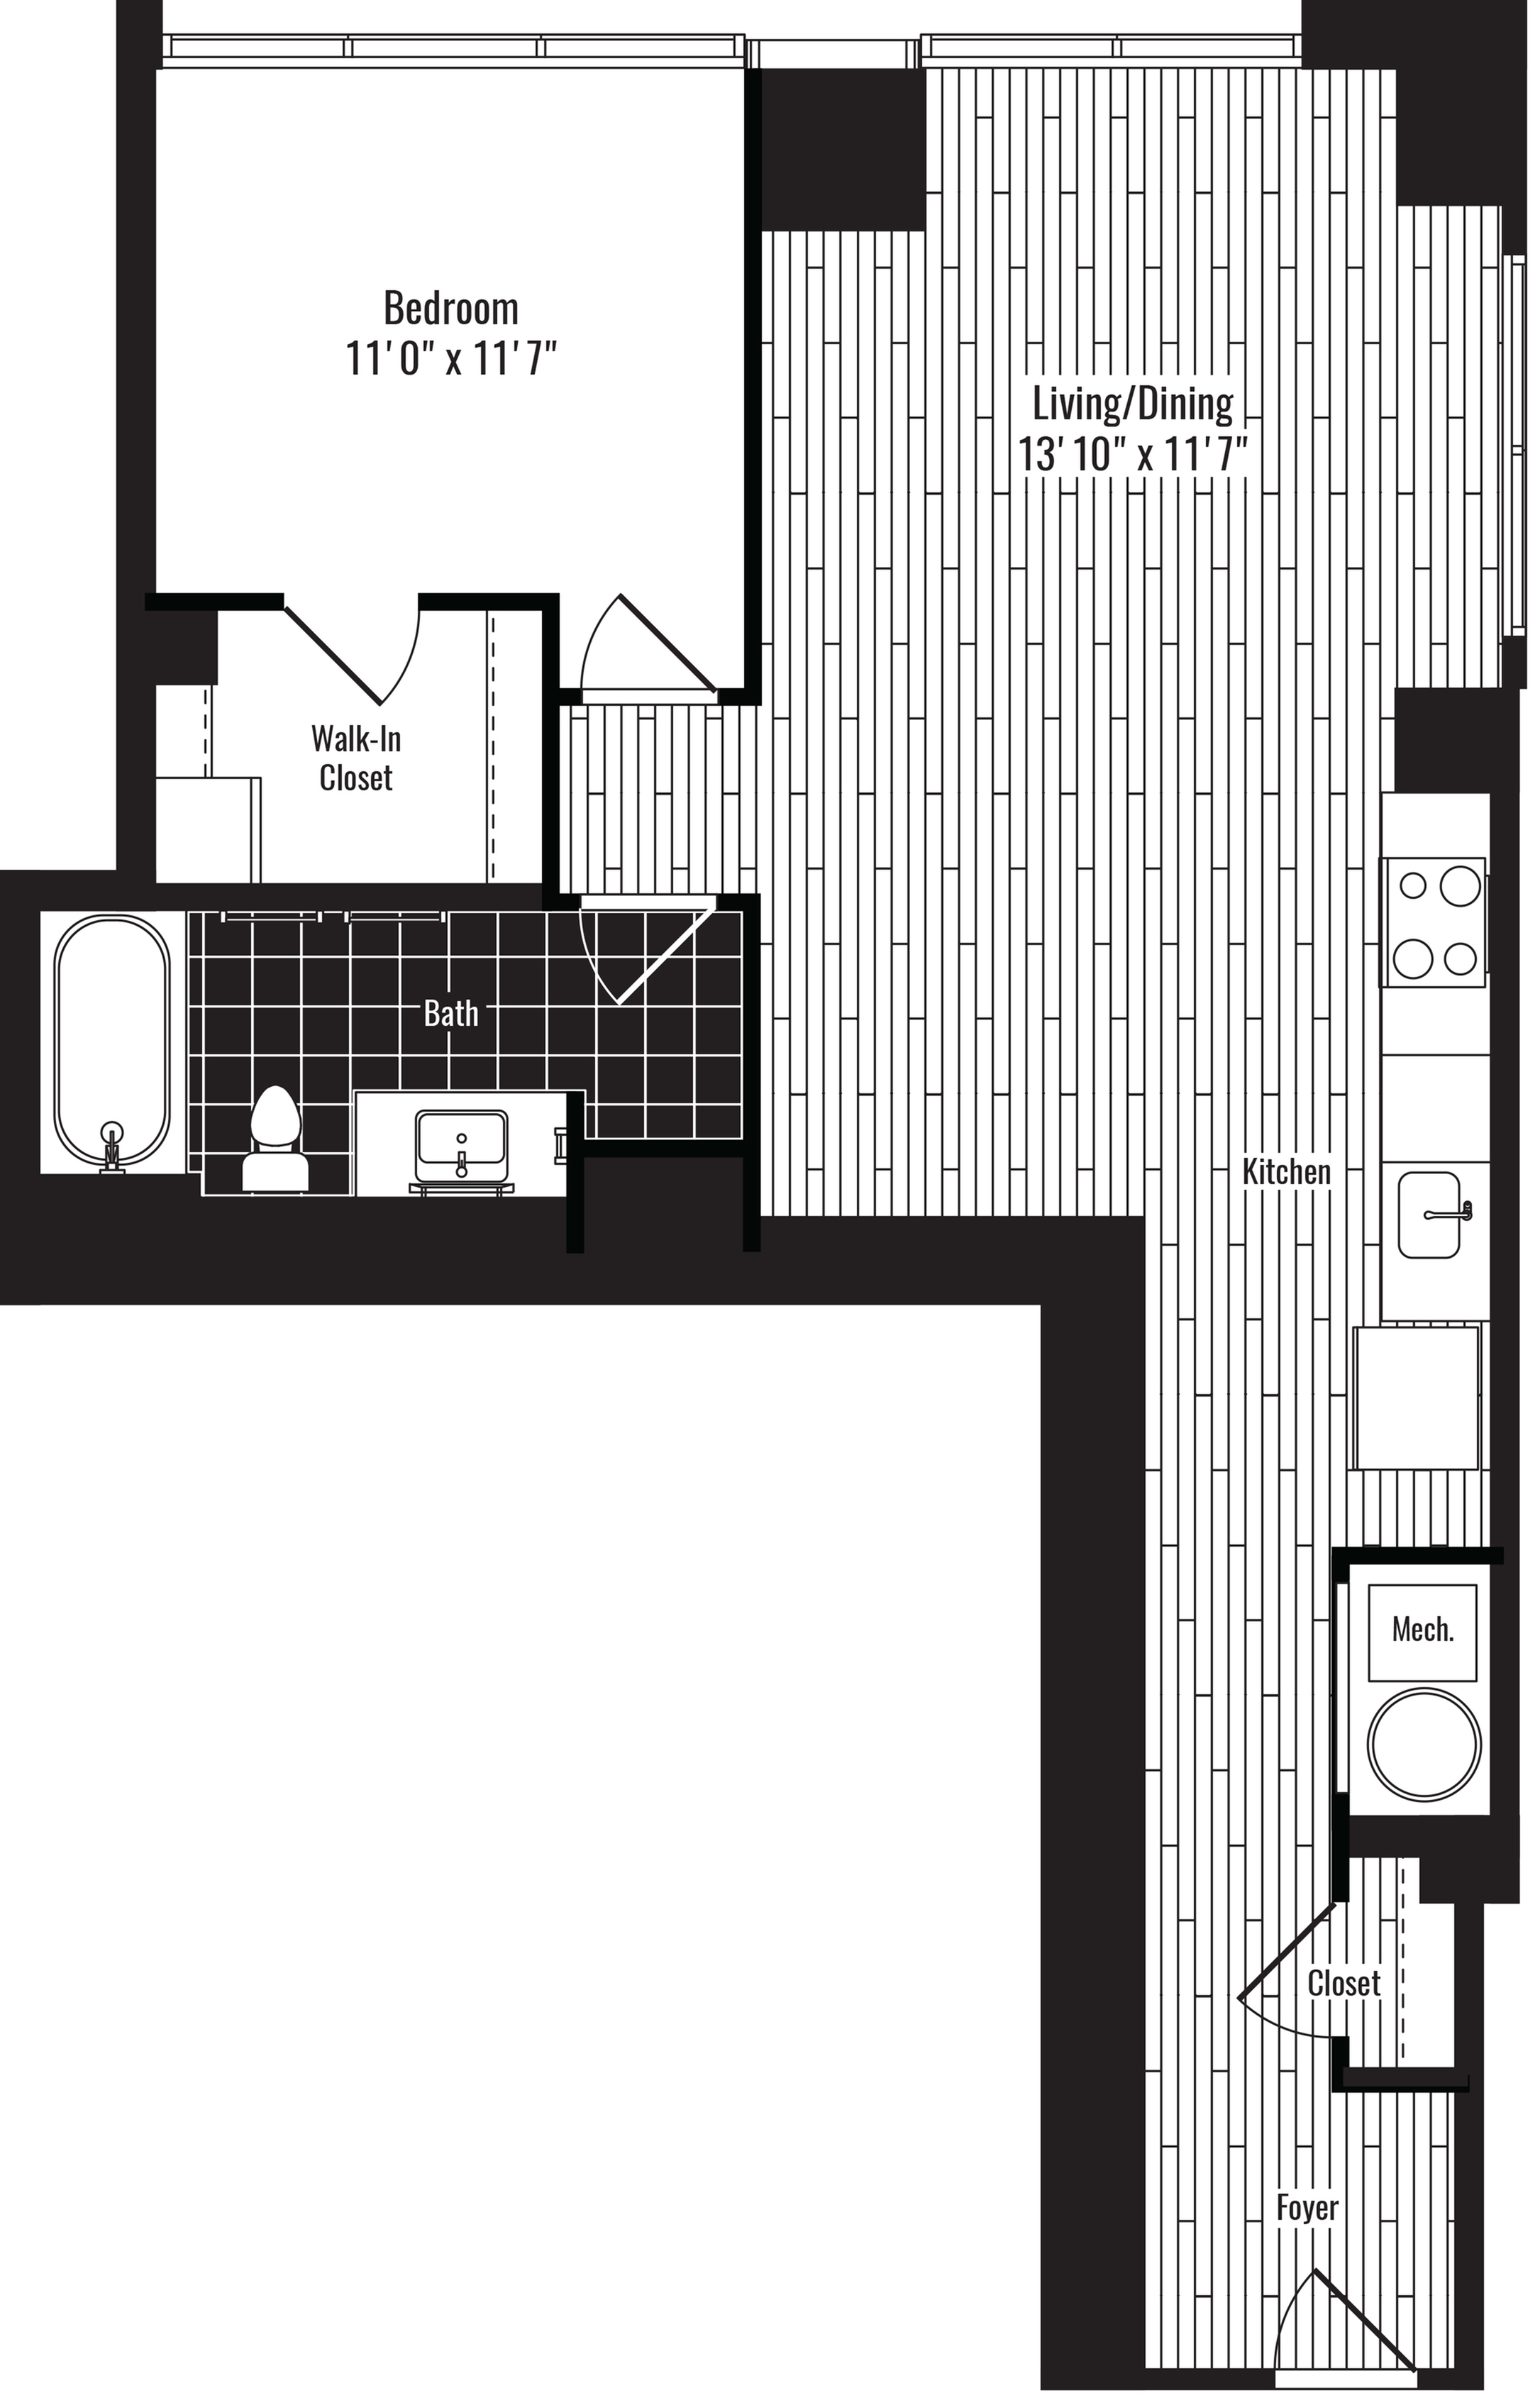 763 square foot one bedroom one bath apartment floorplan image